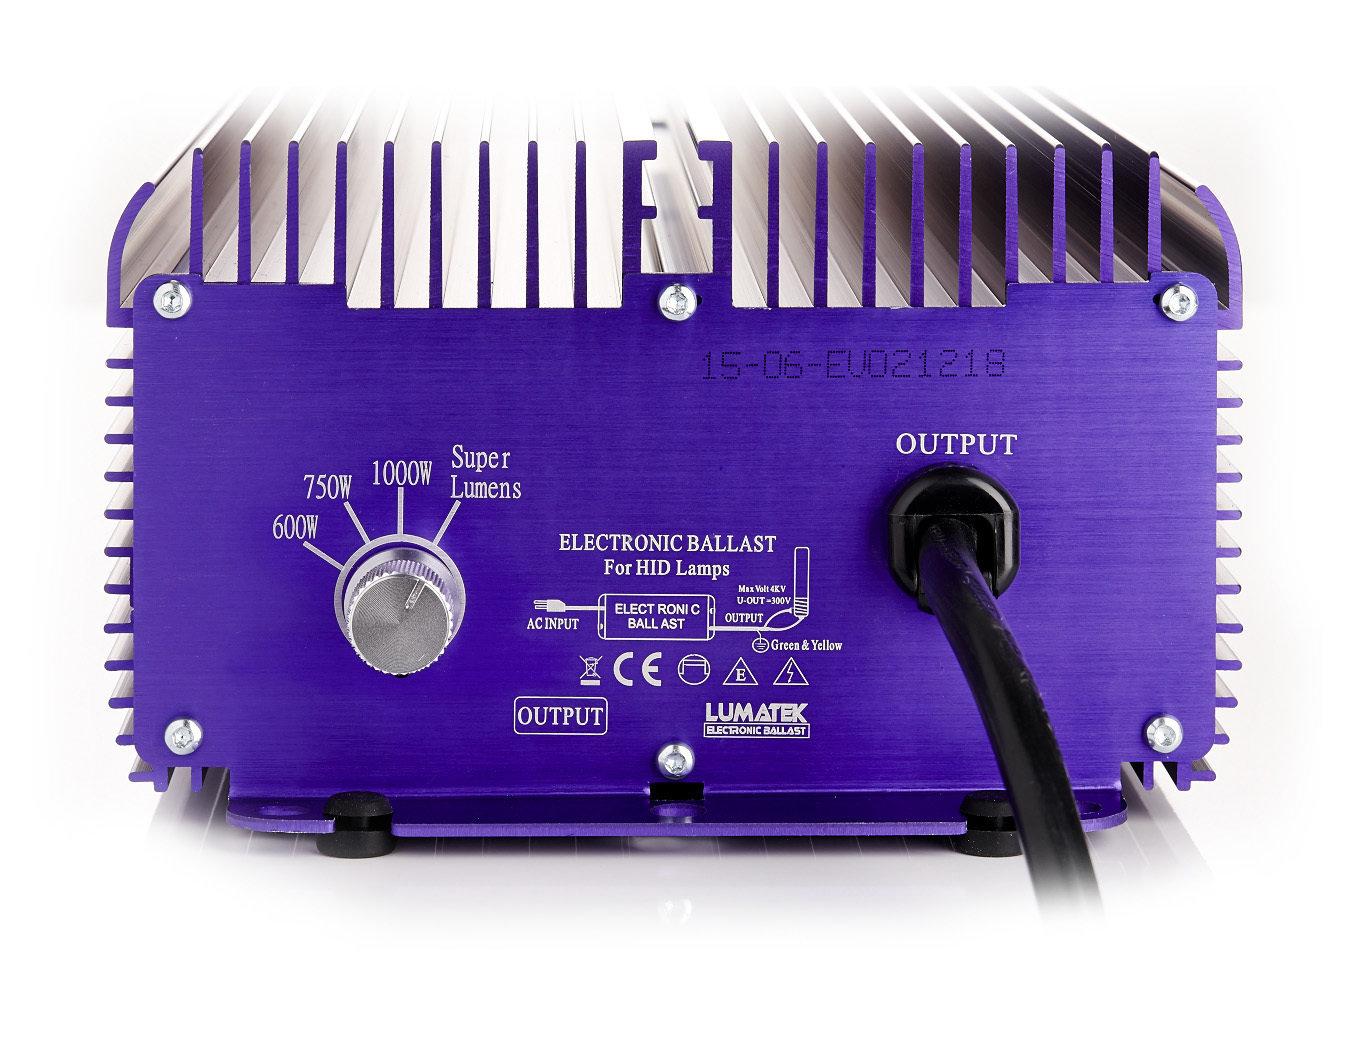 Балласт Lumatek 1000-600W для HPS (ДНАТ) и MH (МГЛ) ламп